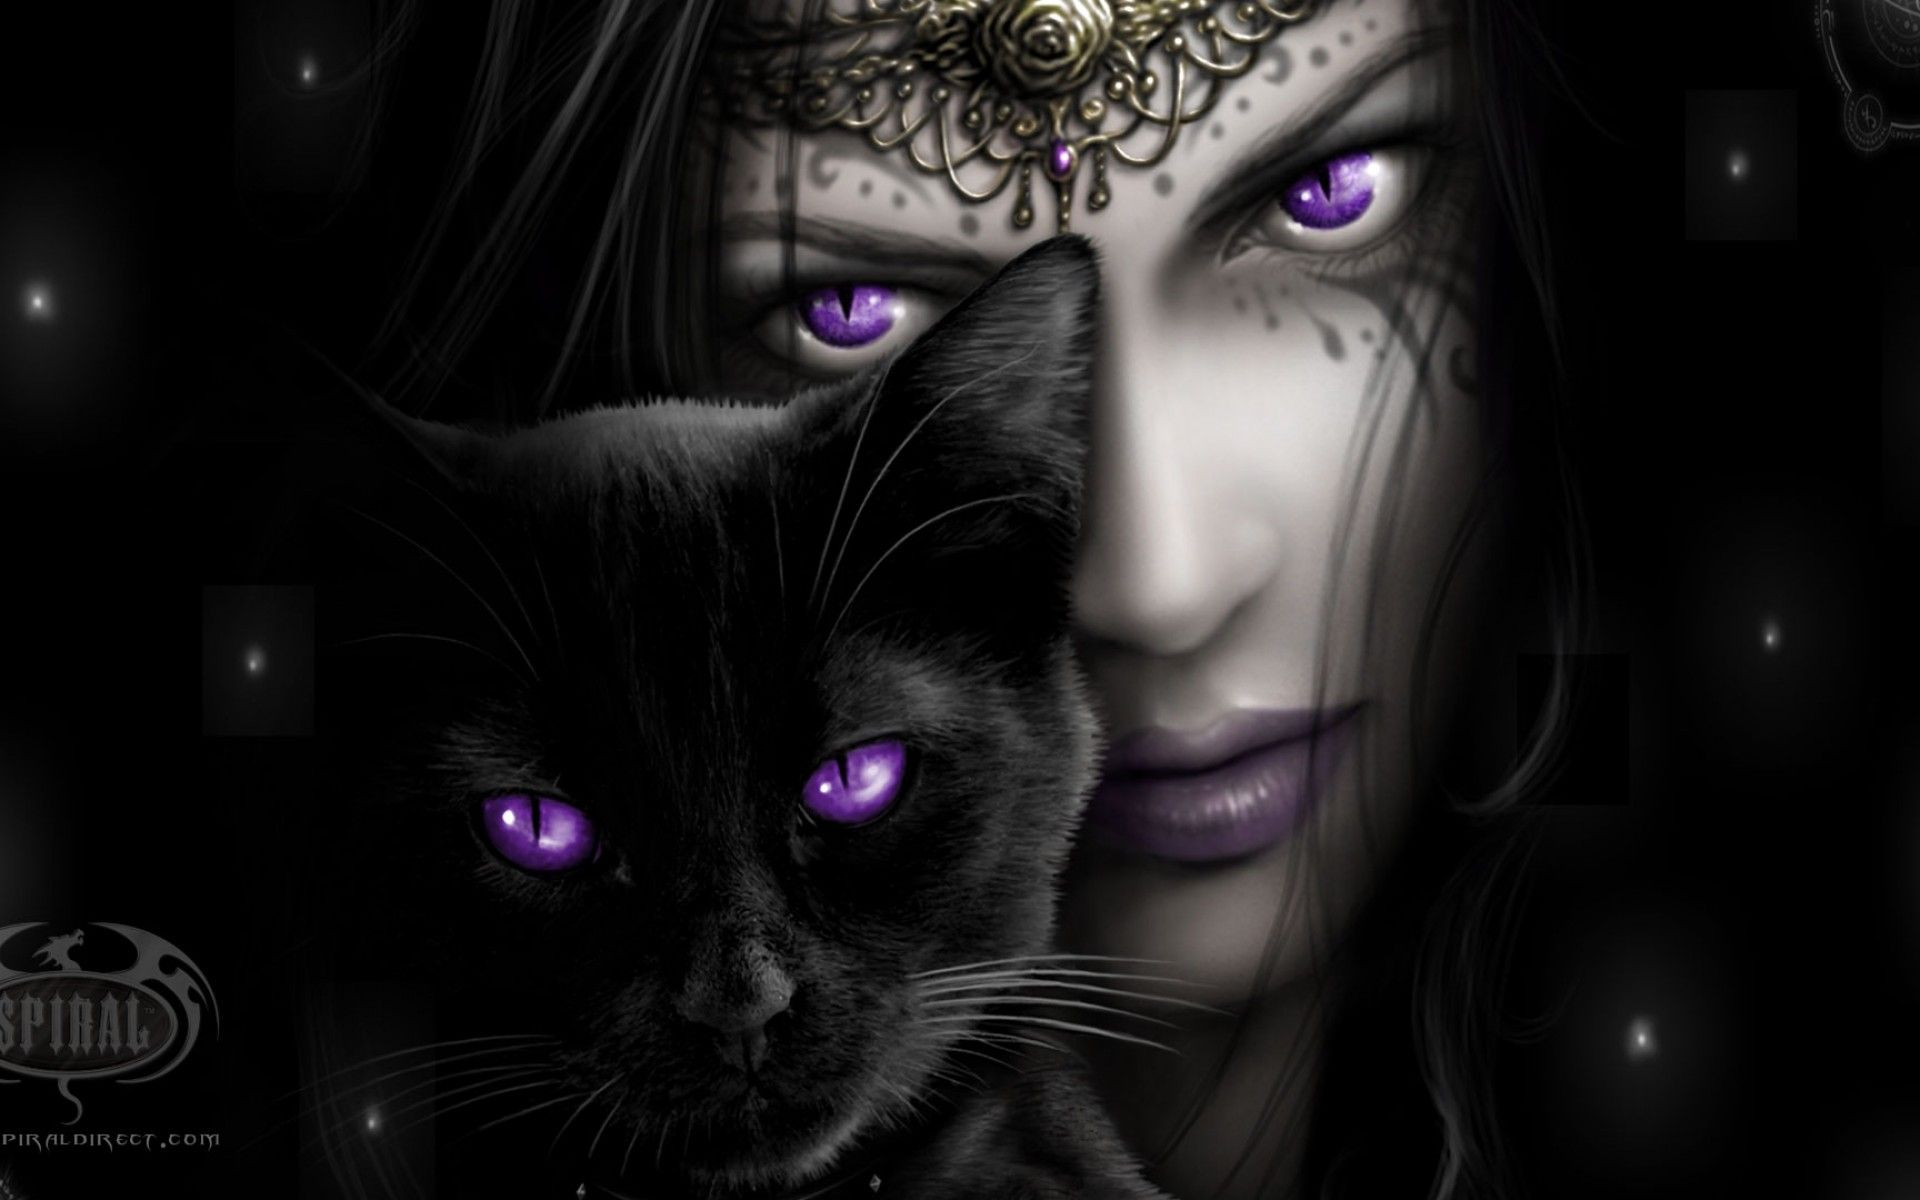 Female Vampire Wallpapers 2880 X 1800 2560 X 1600 1920 X 1200 1680 X 1050 1440 X 900 1280 X 800 Mujer Gato Oscuro Gotico Black Cat